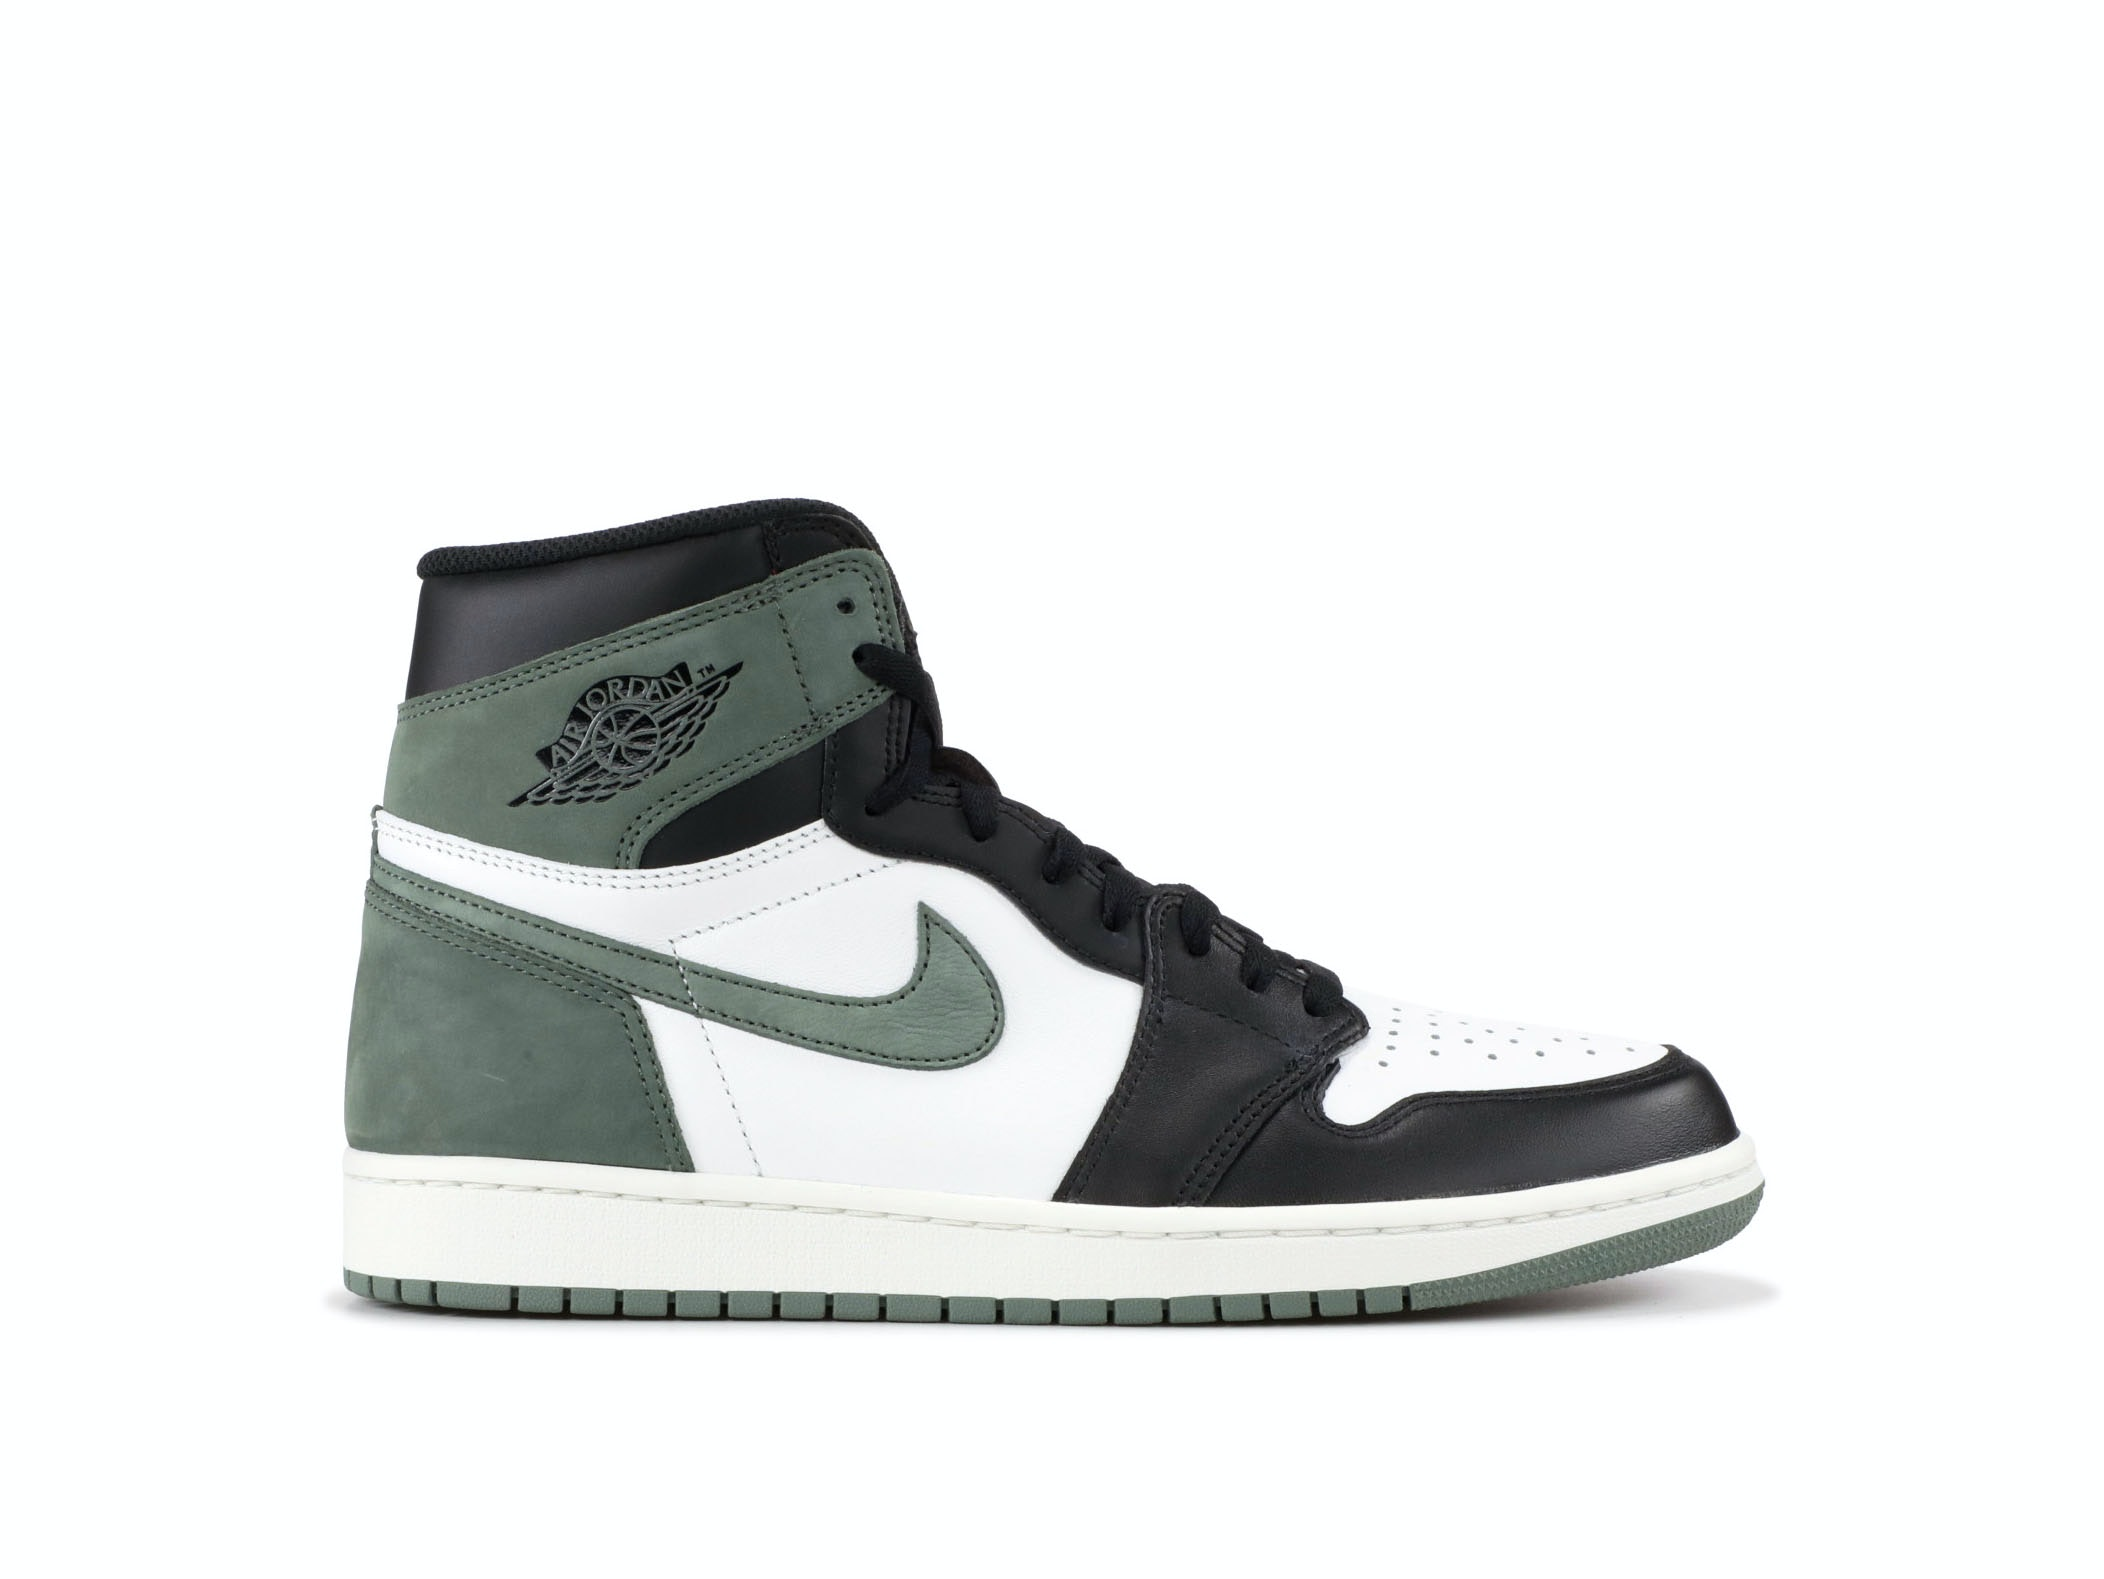 80123d2b5d0 Shop Air Jordan 1 Retro High OG Clay Green Online   Laced